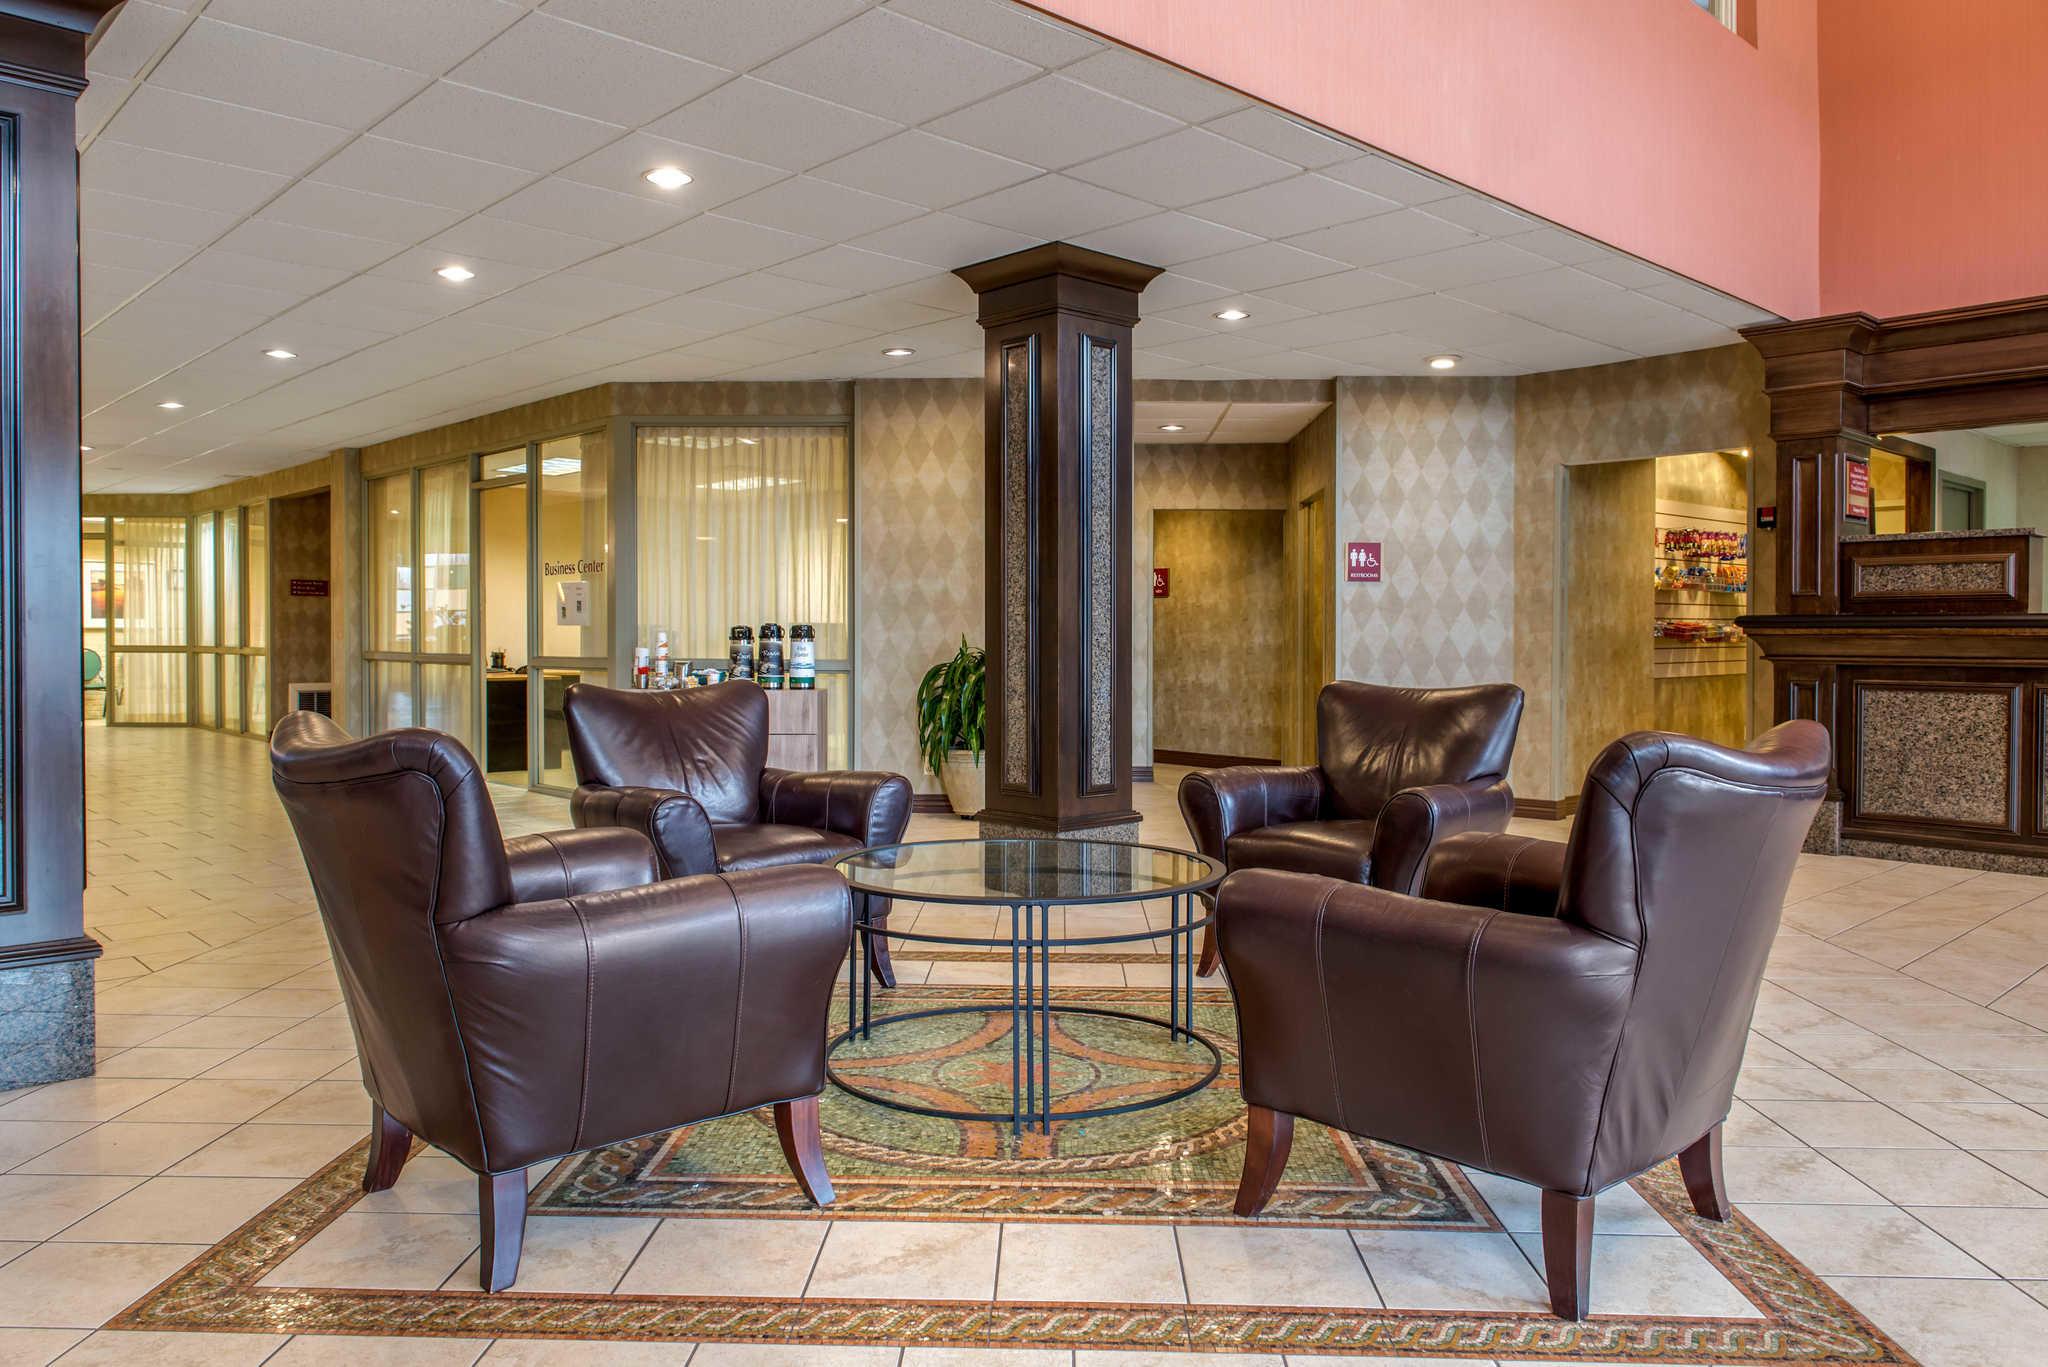 Quality Hotel - Cincinnati Blue Ash image 3